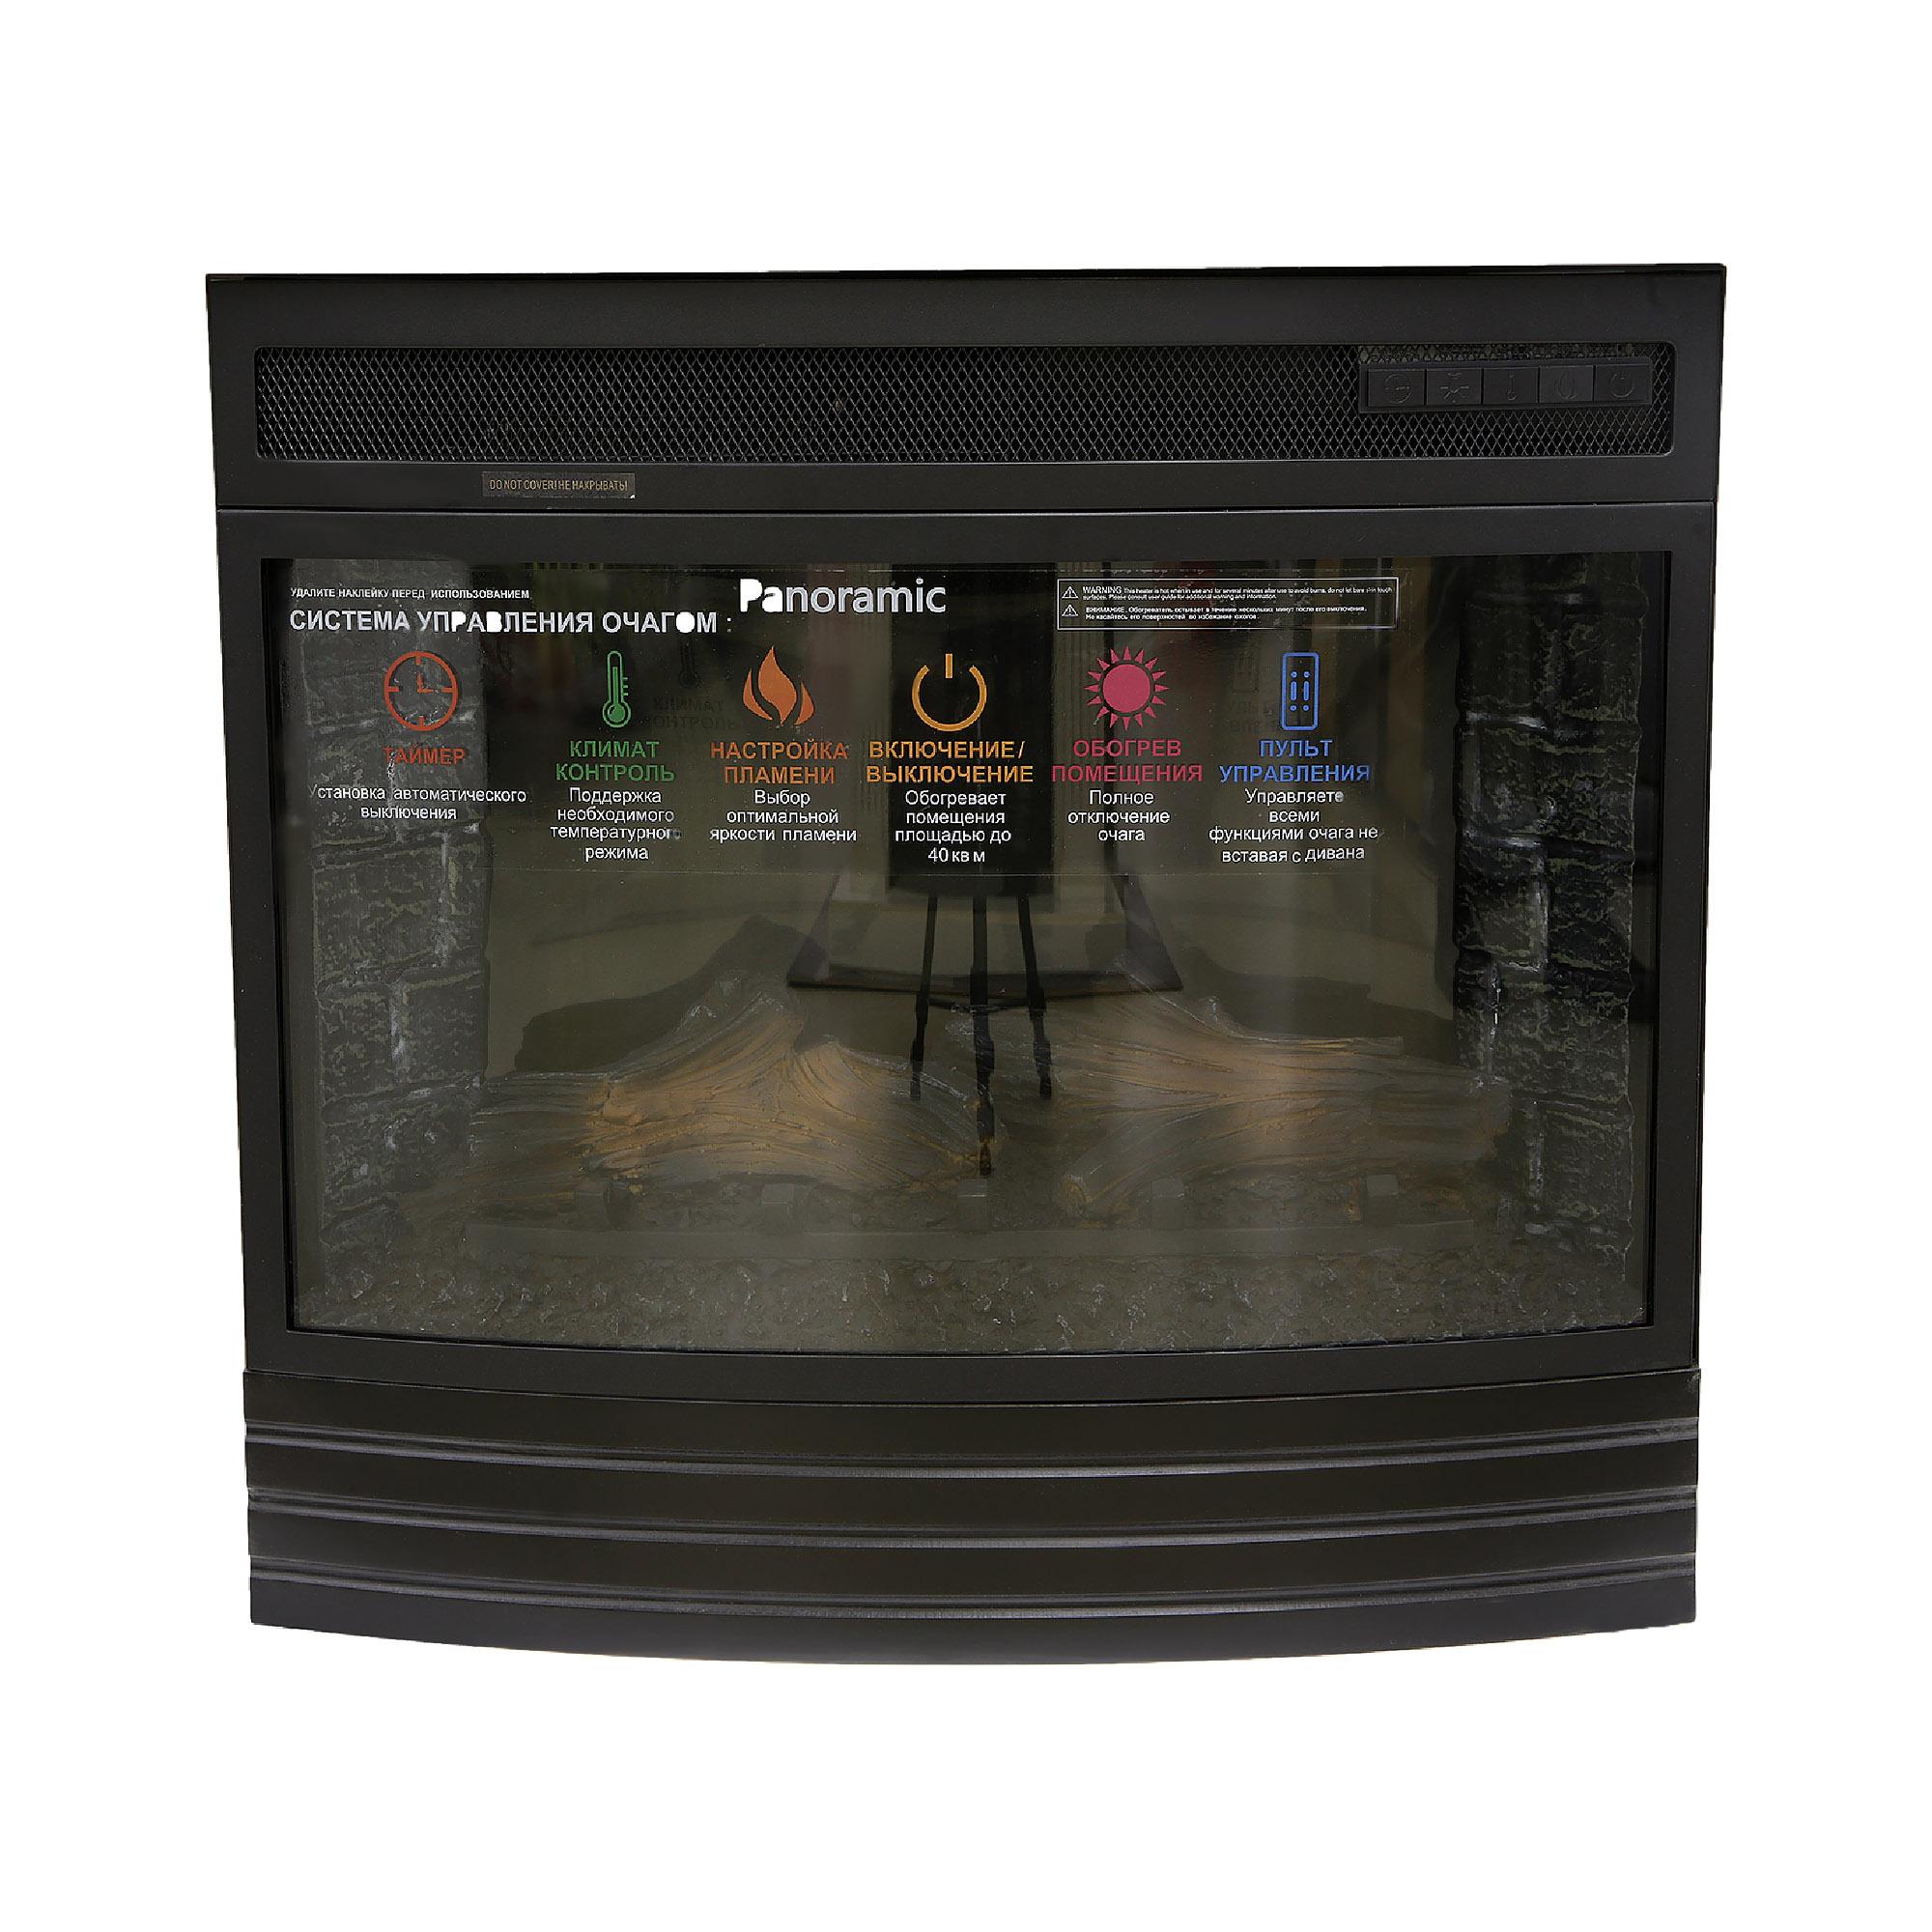 Электрический камин Interflame Panoramic 08-25 LED F/X фото